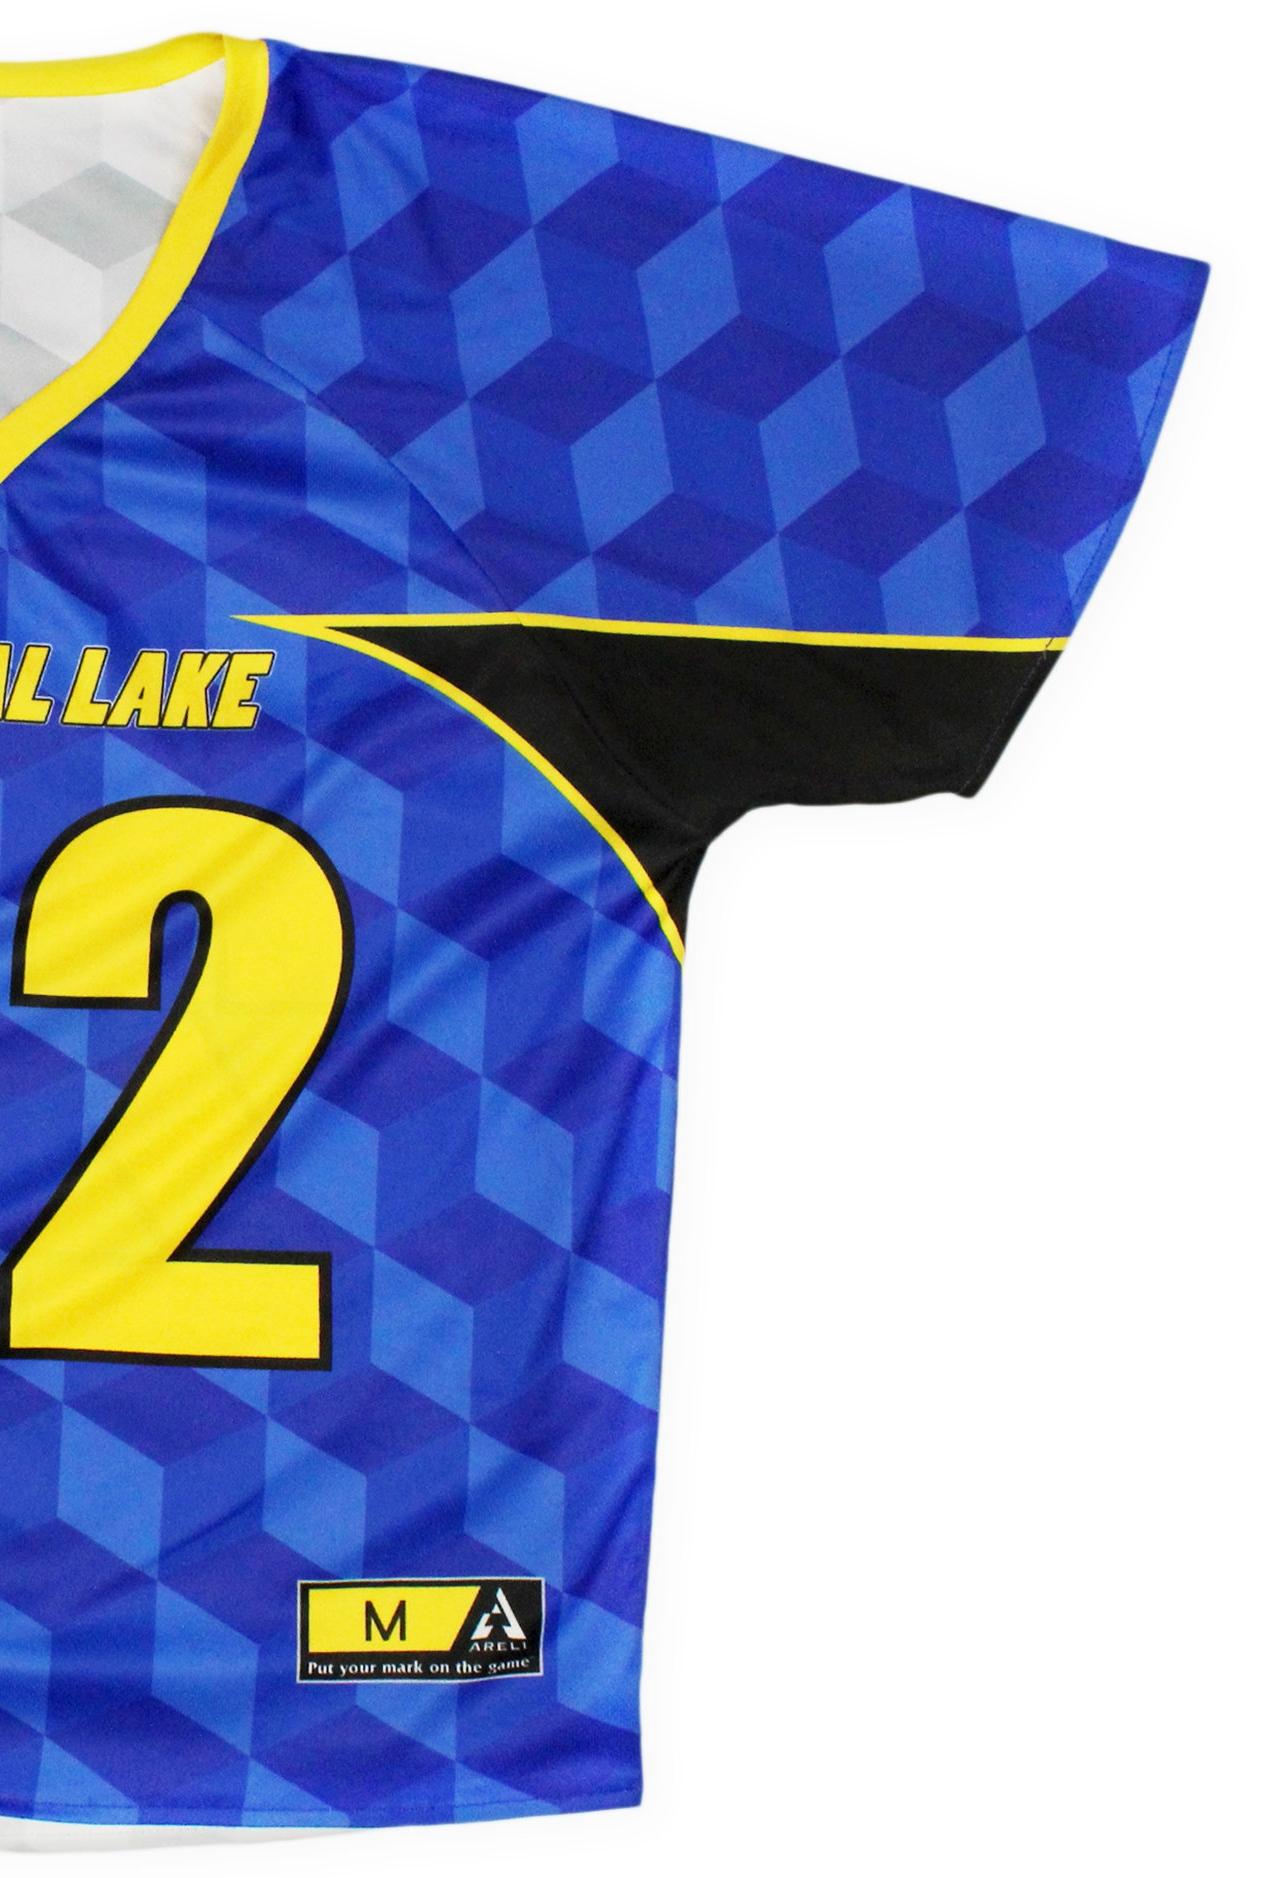 Lacrosse - Custom designed fully sublimated lacrosse essentials